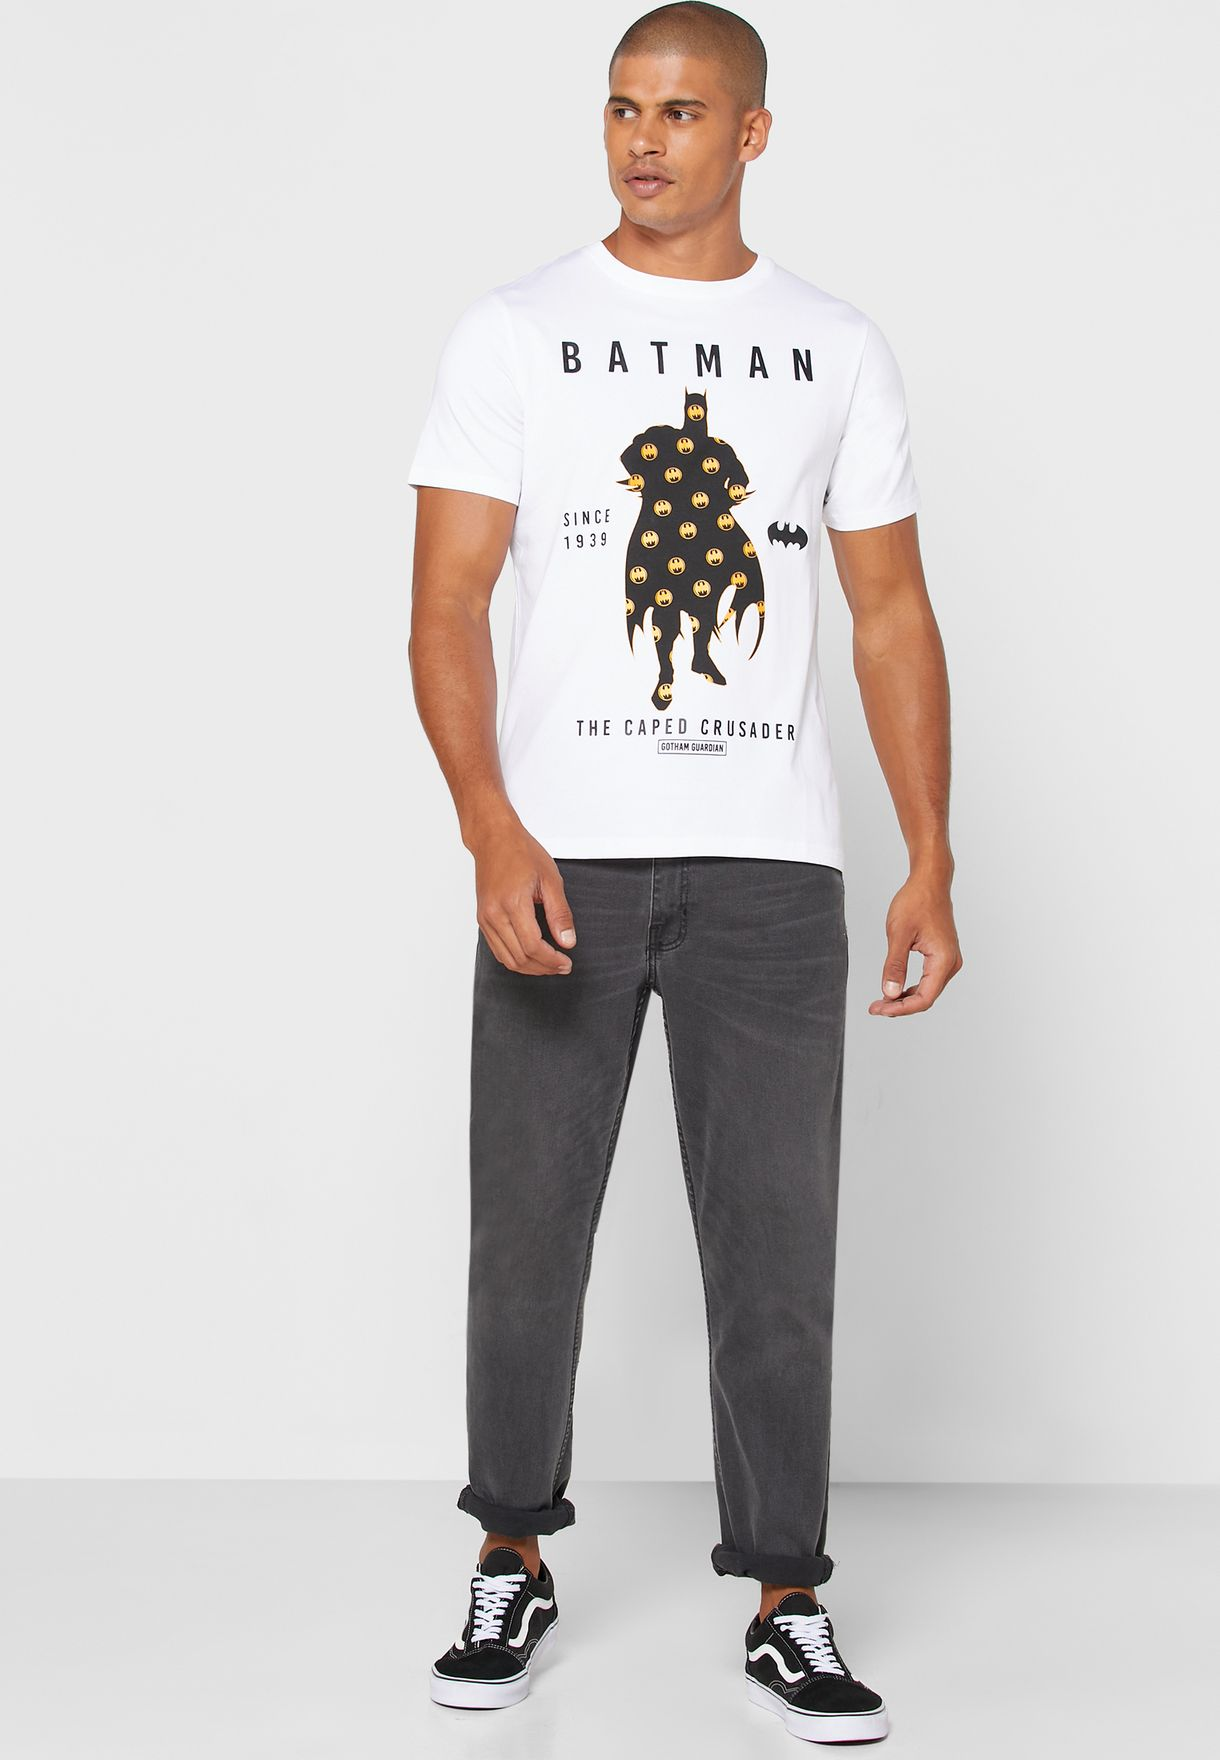 Batman Crew Neck T-Shirt